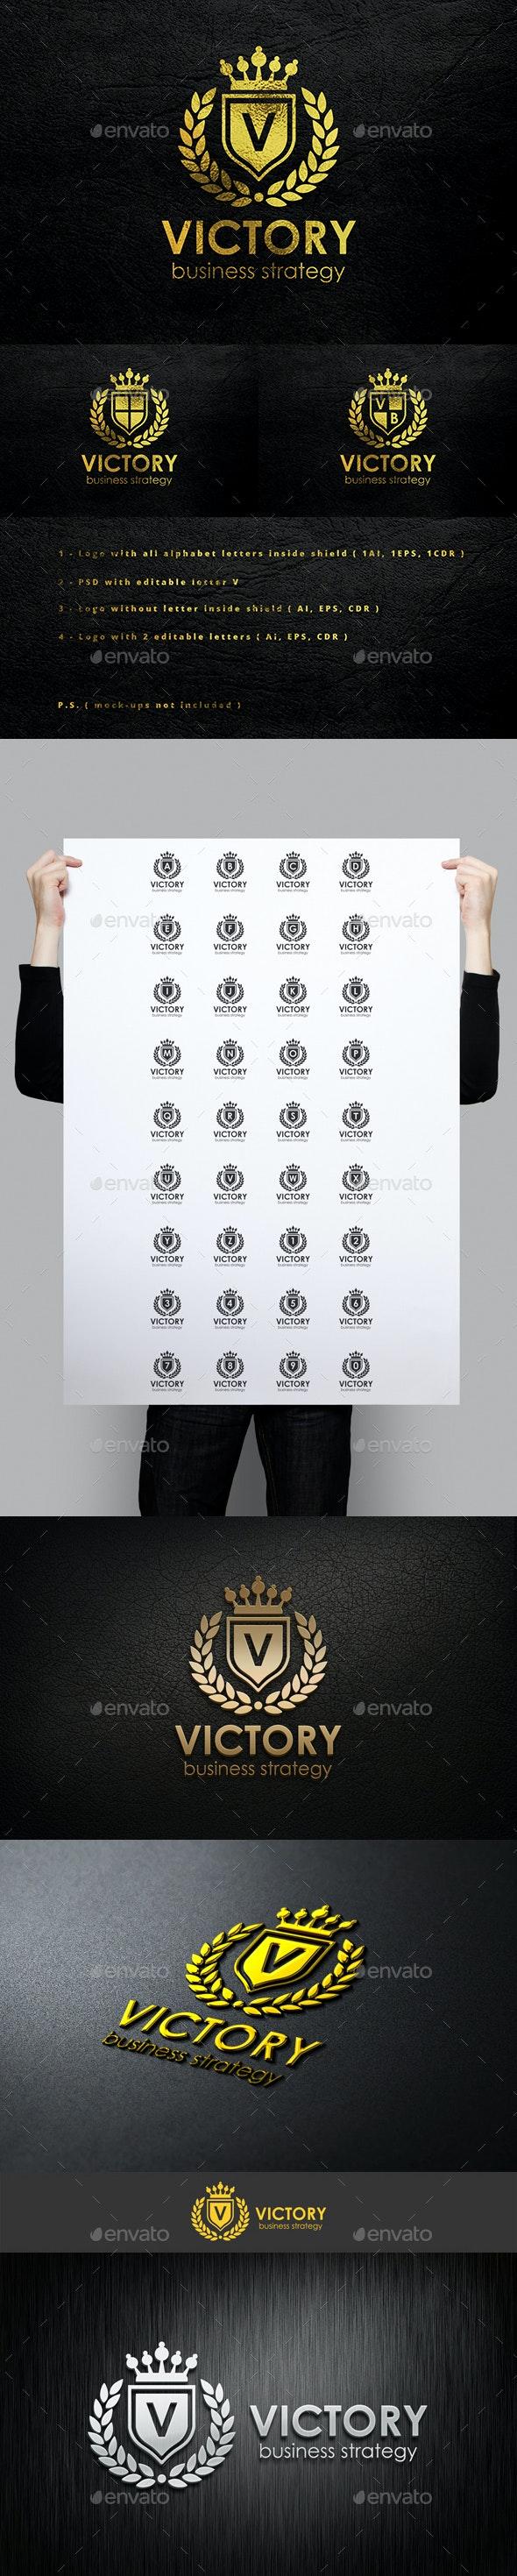 Victory - Heraldic Elegant Logo Crest Multipurpose Logo - Crests Logo Templates